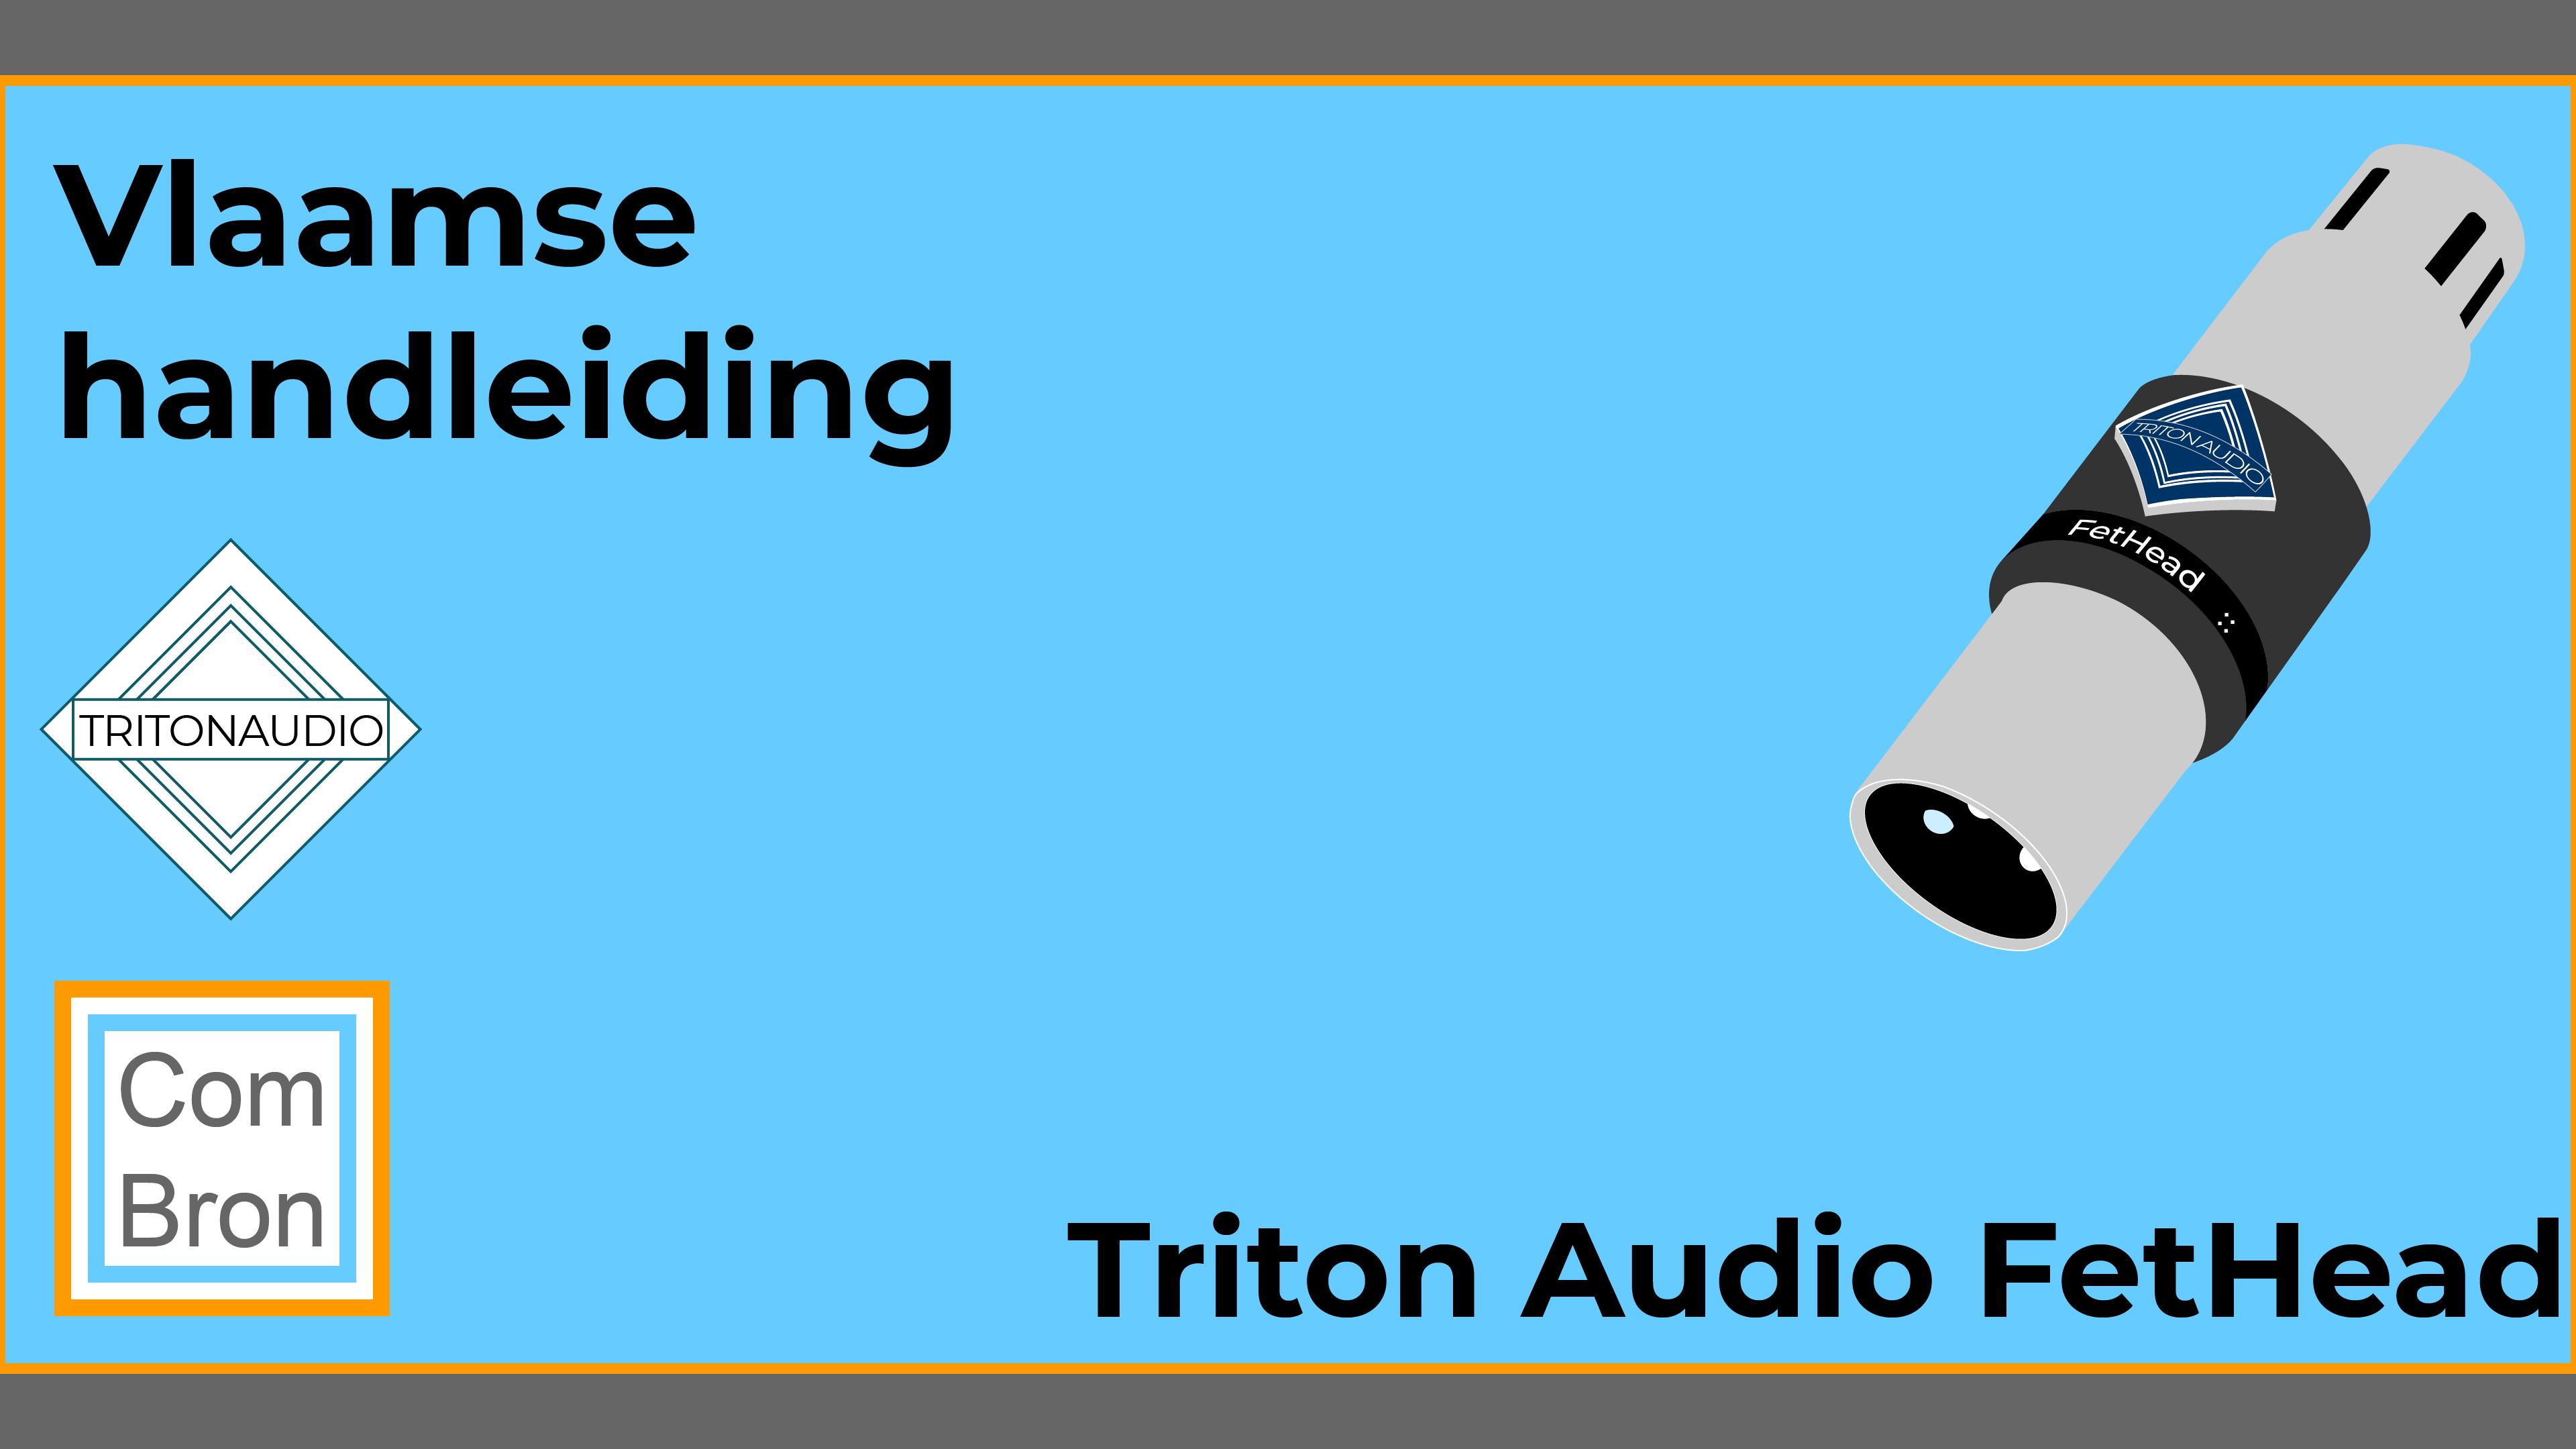 Vlaamse handleiding Triton Audio Fethead.